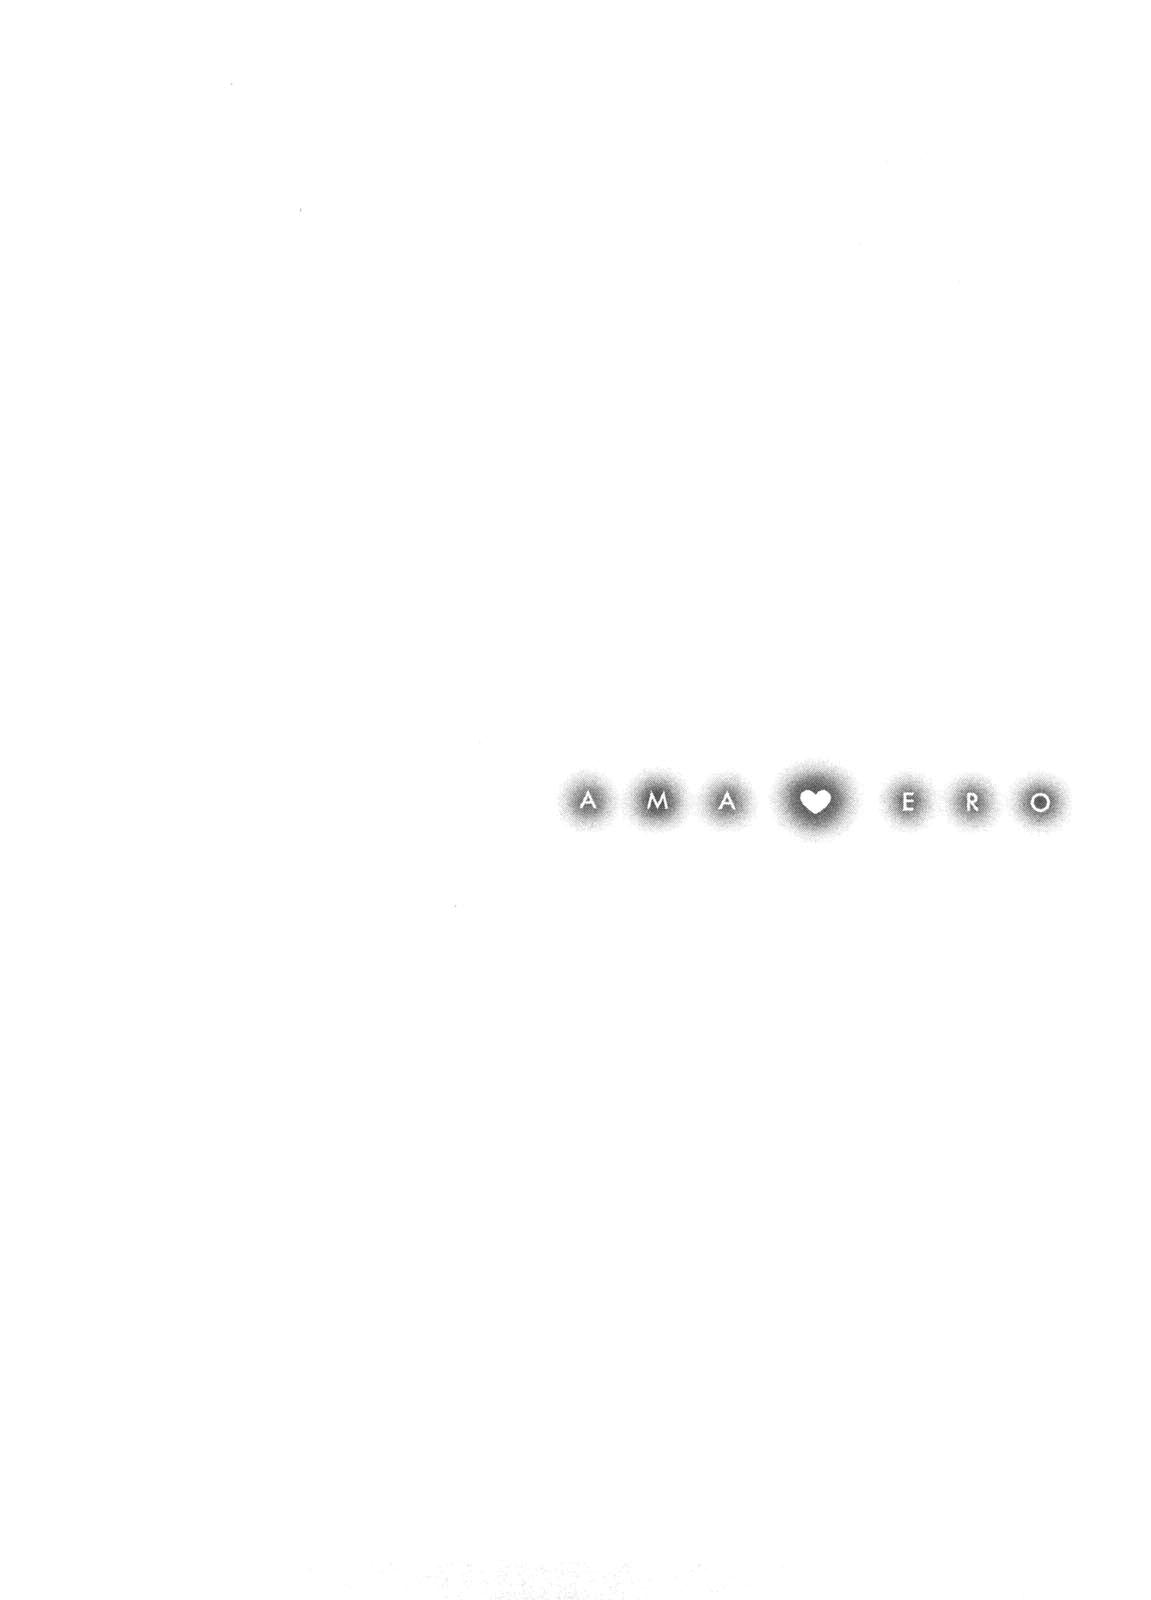 [Hanzaki Jirou] Ama Ero - Sweet Sugar Baby Ch. 1-3 [English] [Tadanohito] [Decensored] 43